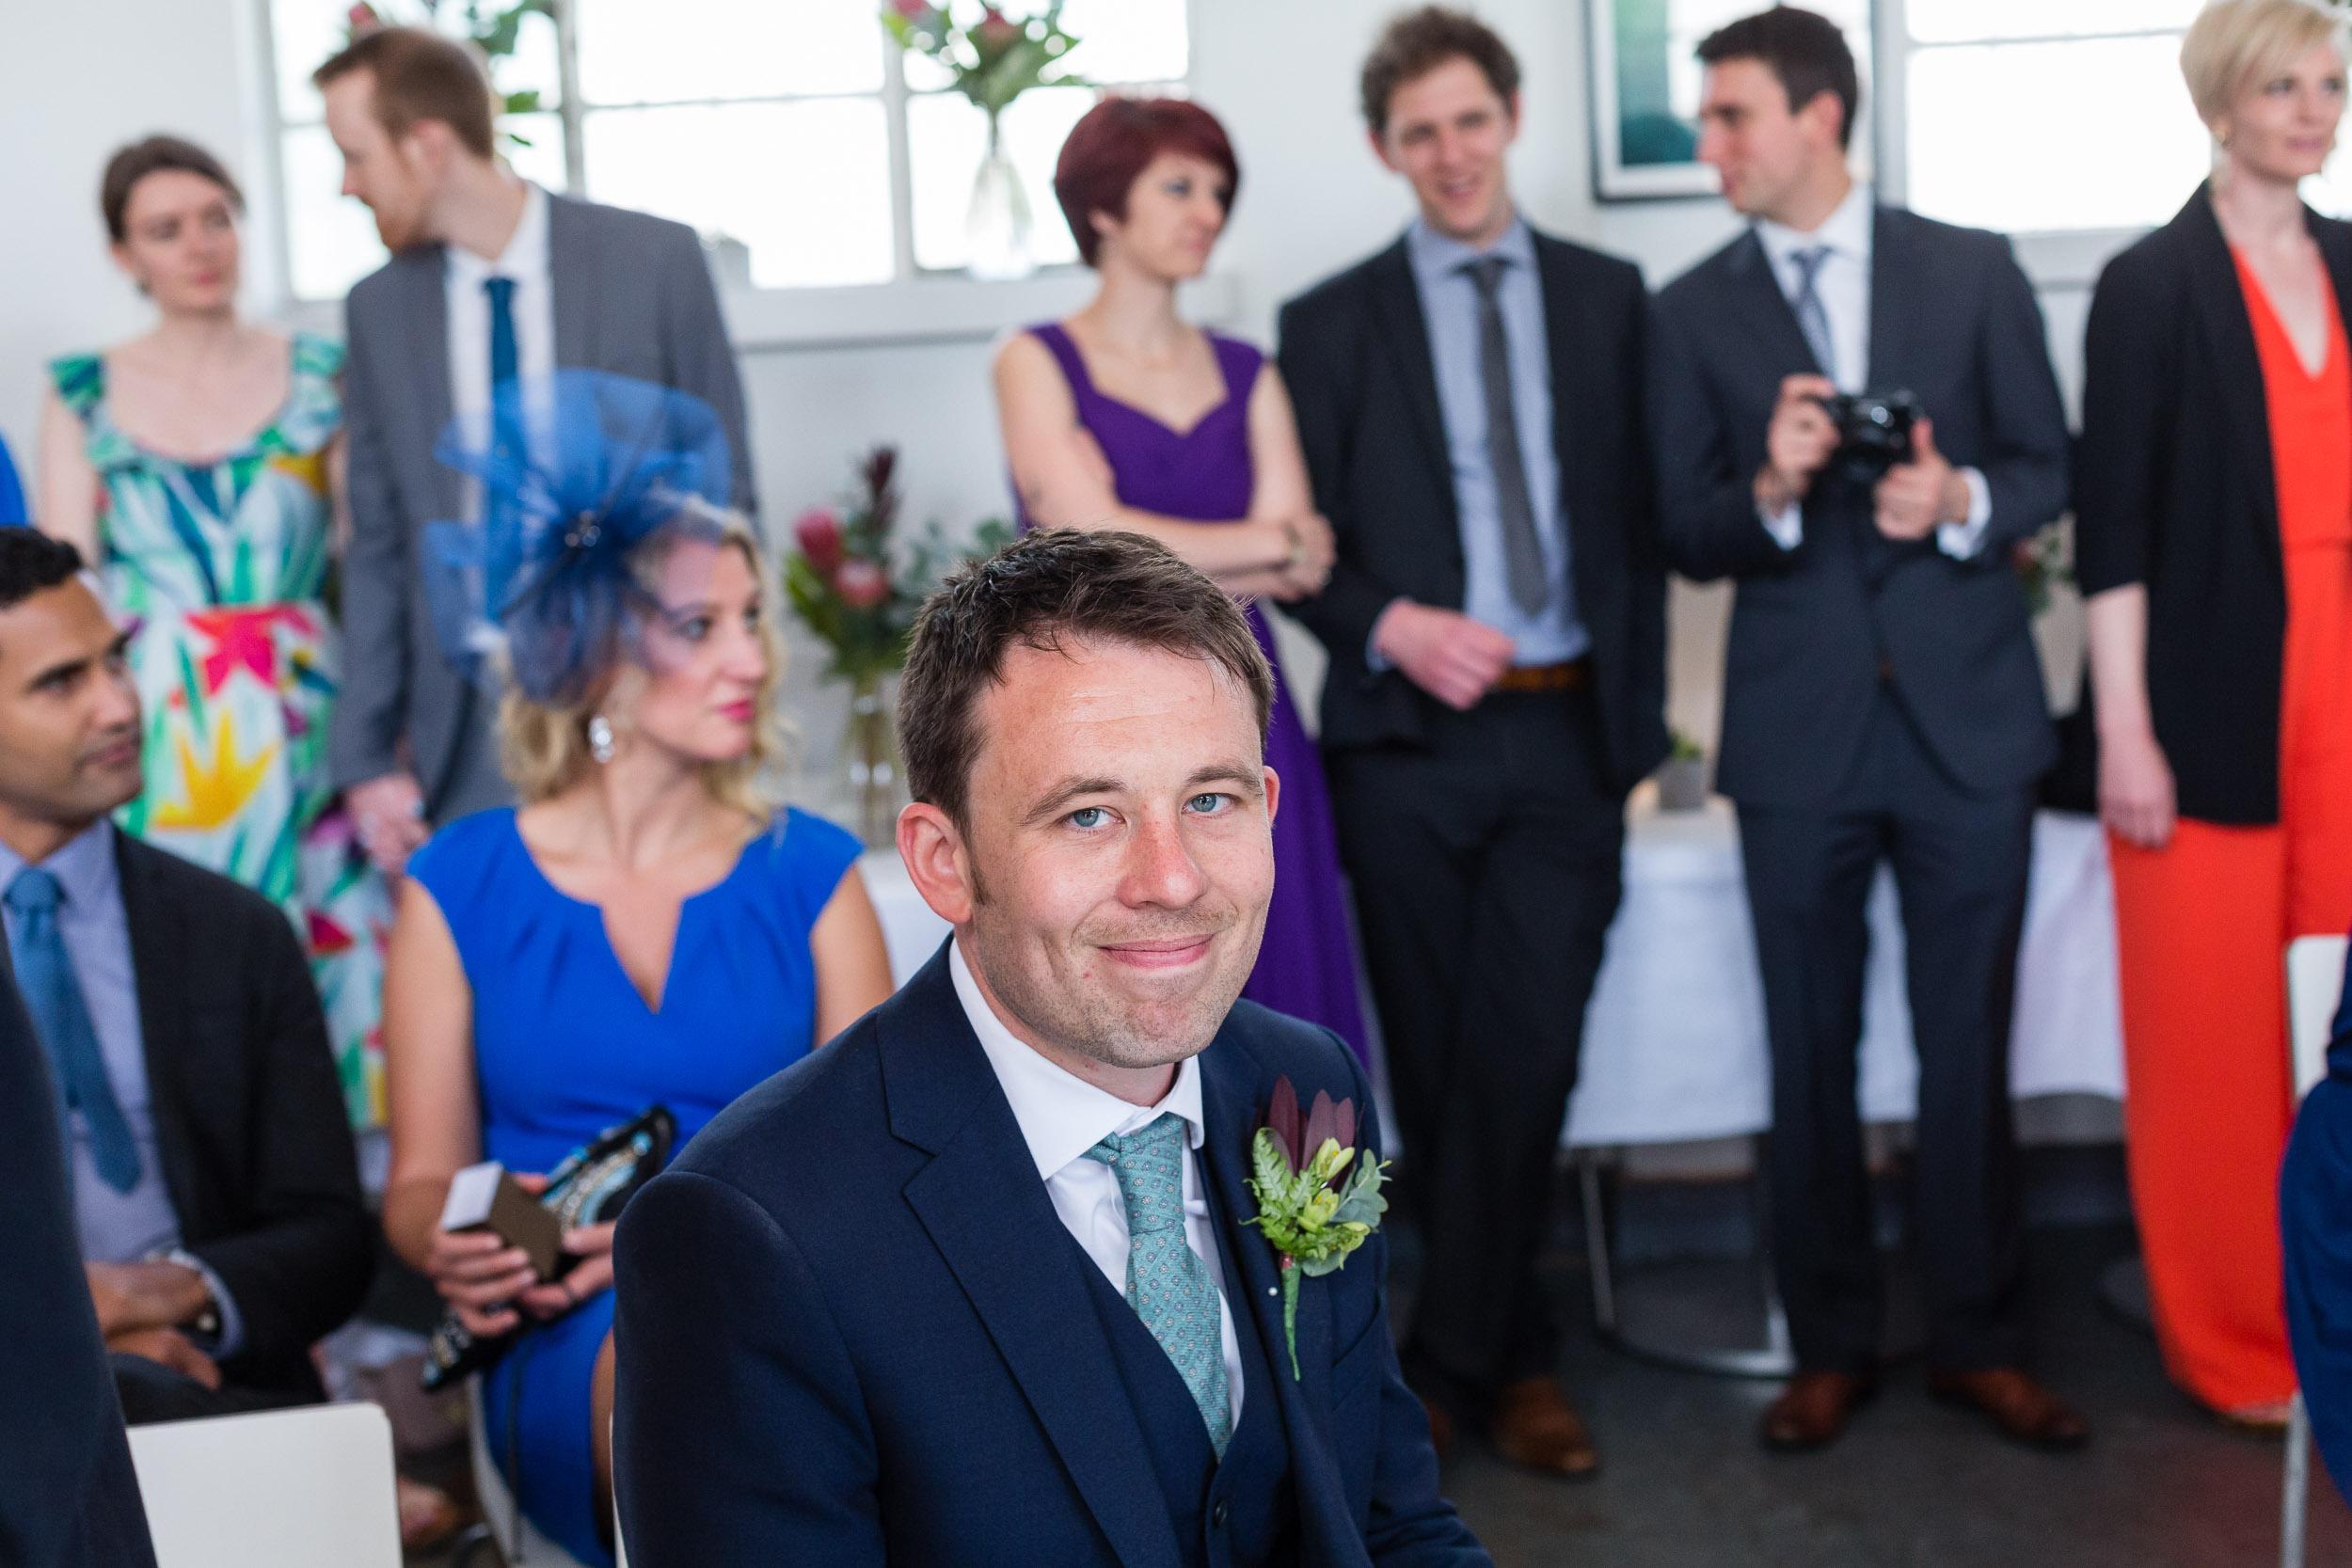 brockwell-lido-brixton-herne-hill-wedding-112.jpg